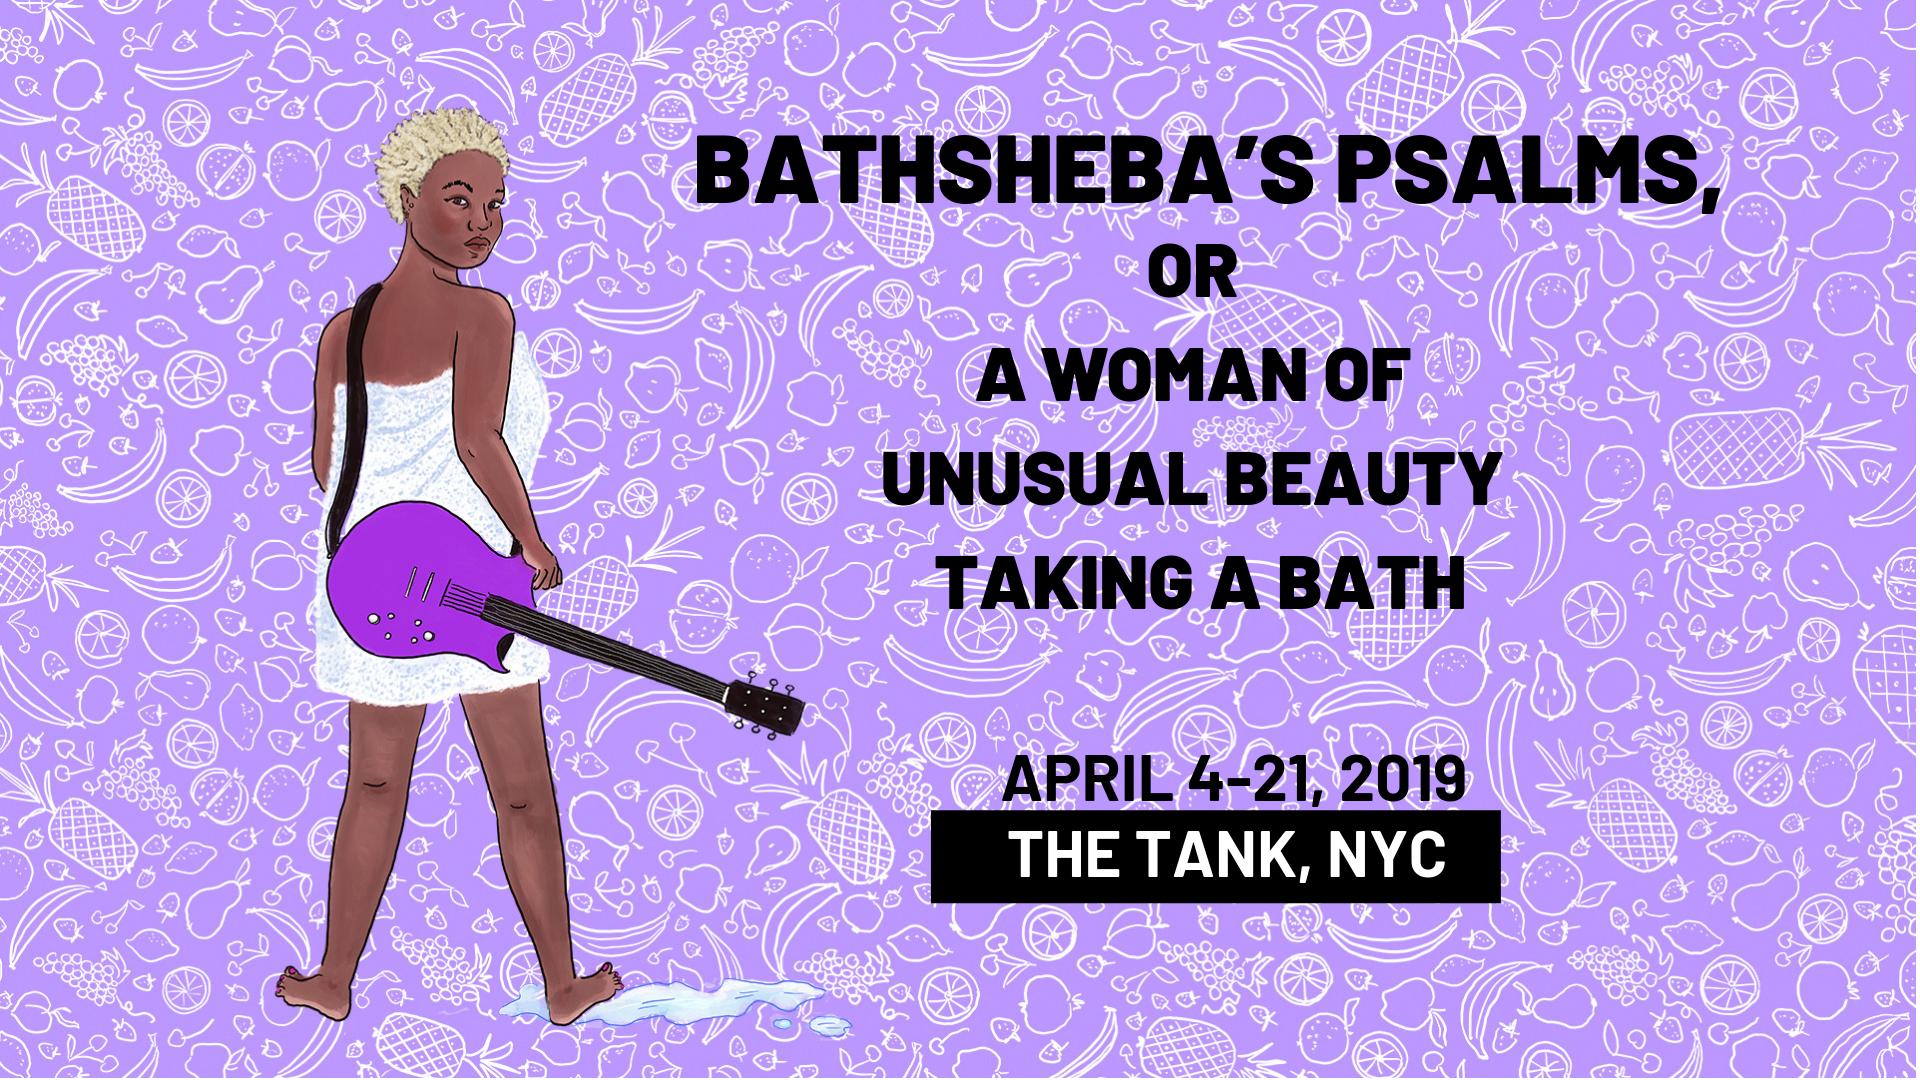 BATHSHEBA'S PSALMS, OR A WOMAN OF UNUSUAL BEAUTY TAKING A BATH (1).png